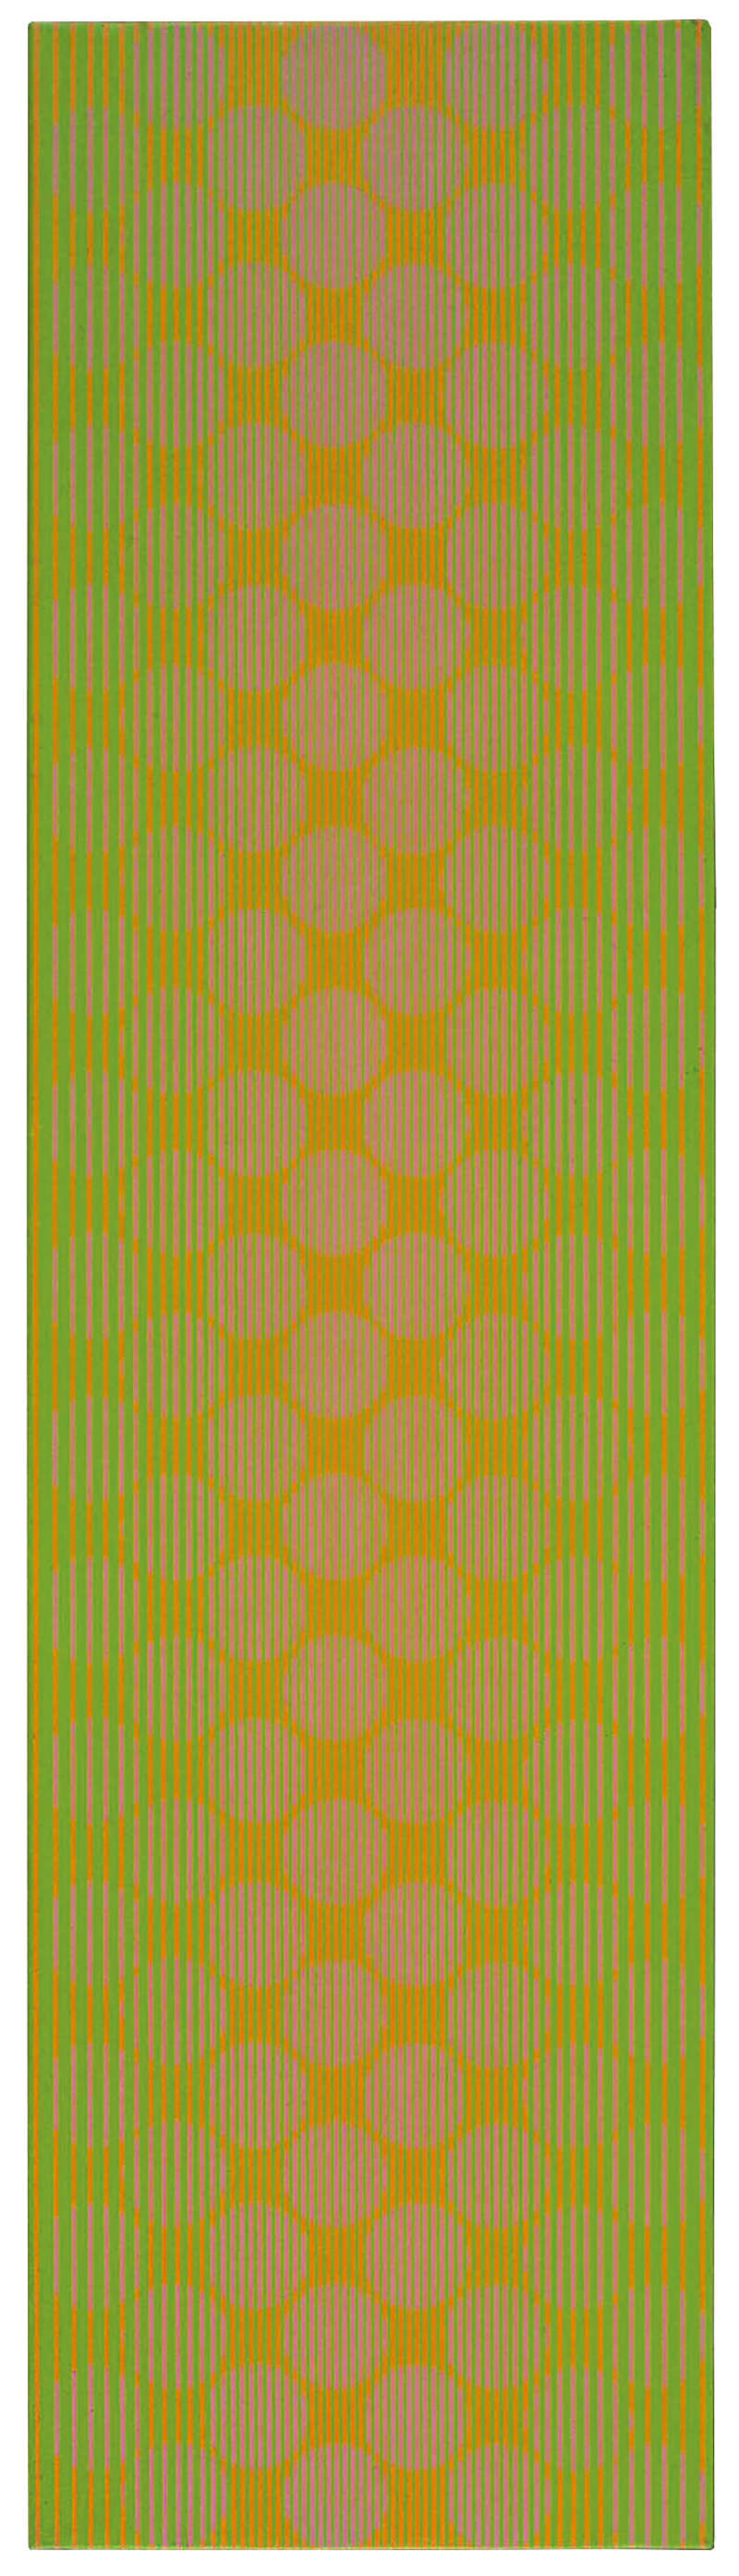 Julian Stańczak, Green Column, 1970. Acrylic on canvas, 111 x 30 cm, 43 3/4 x 11 3/4 in.